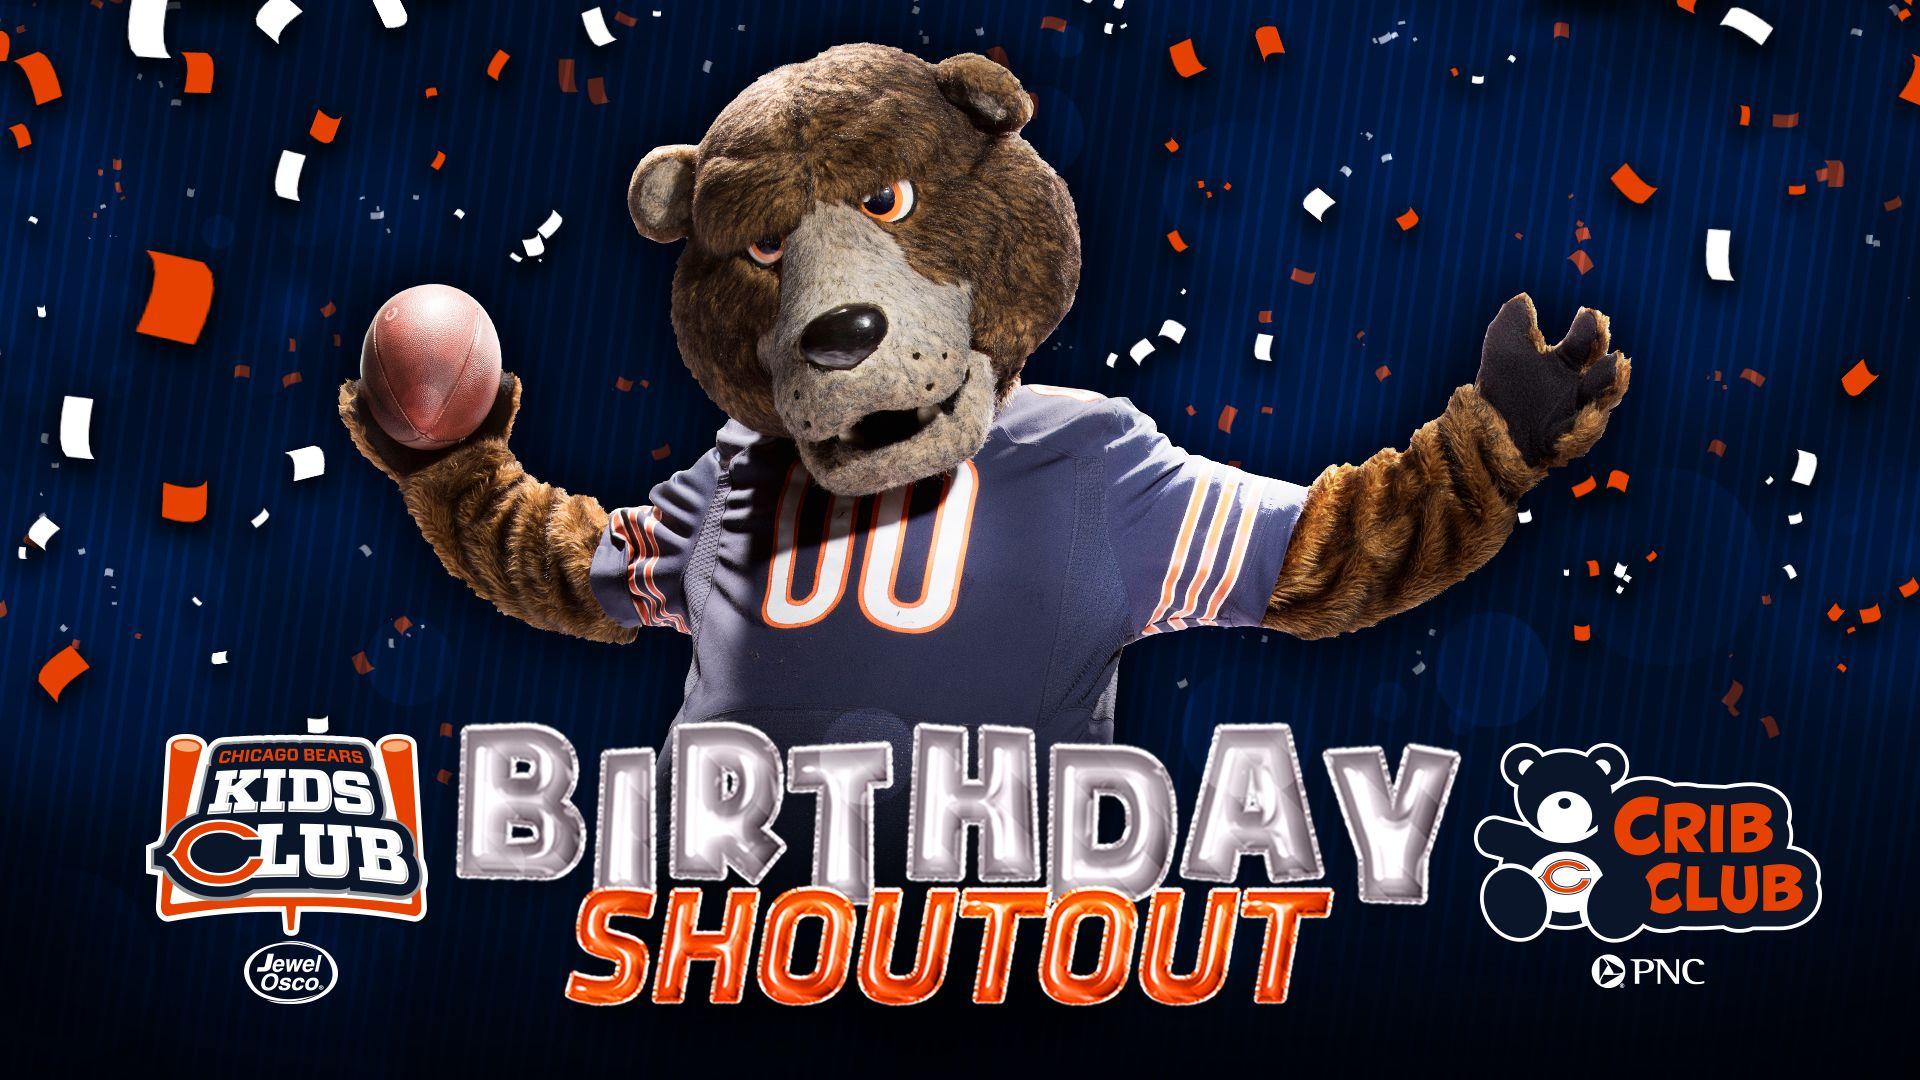 staley-birthday-shoutout-promo-072320